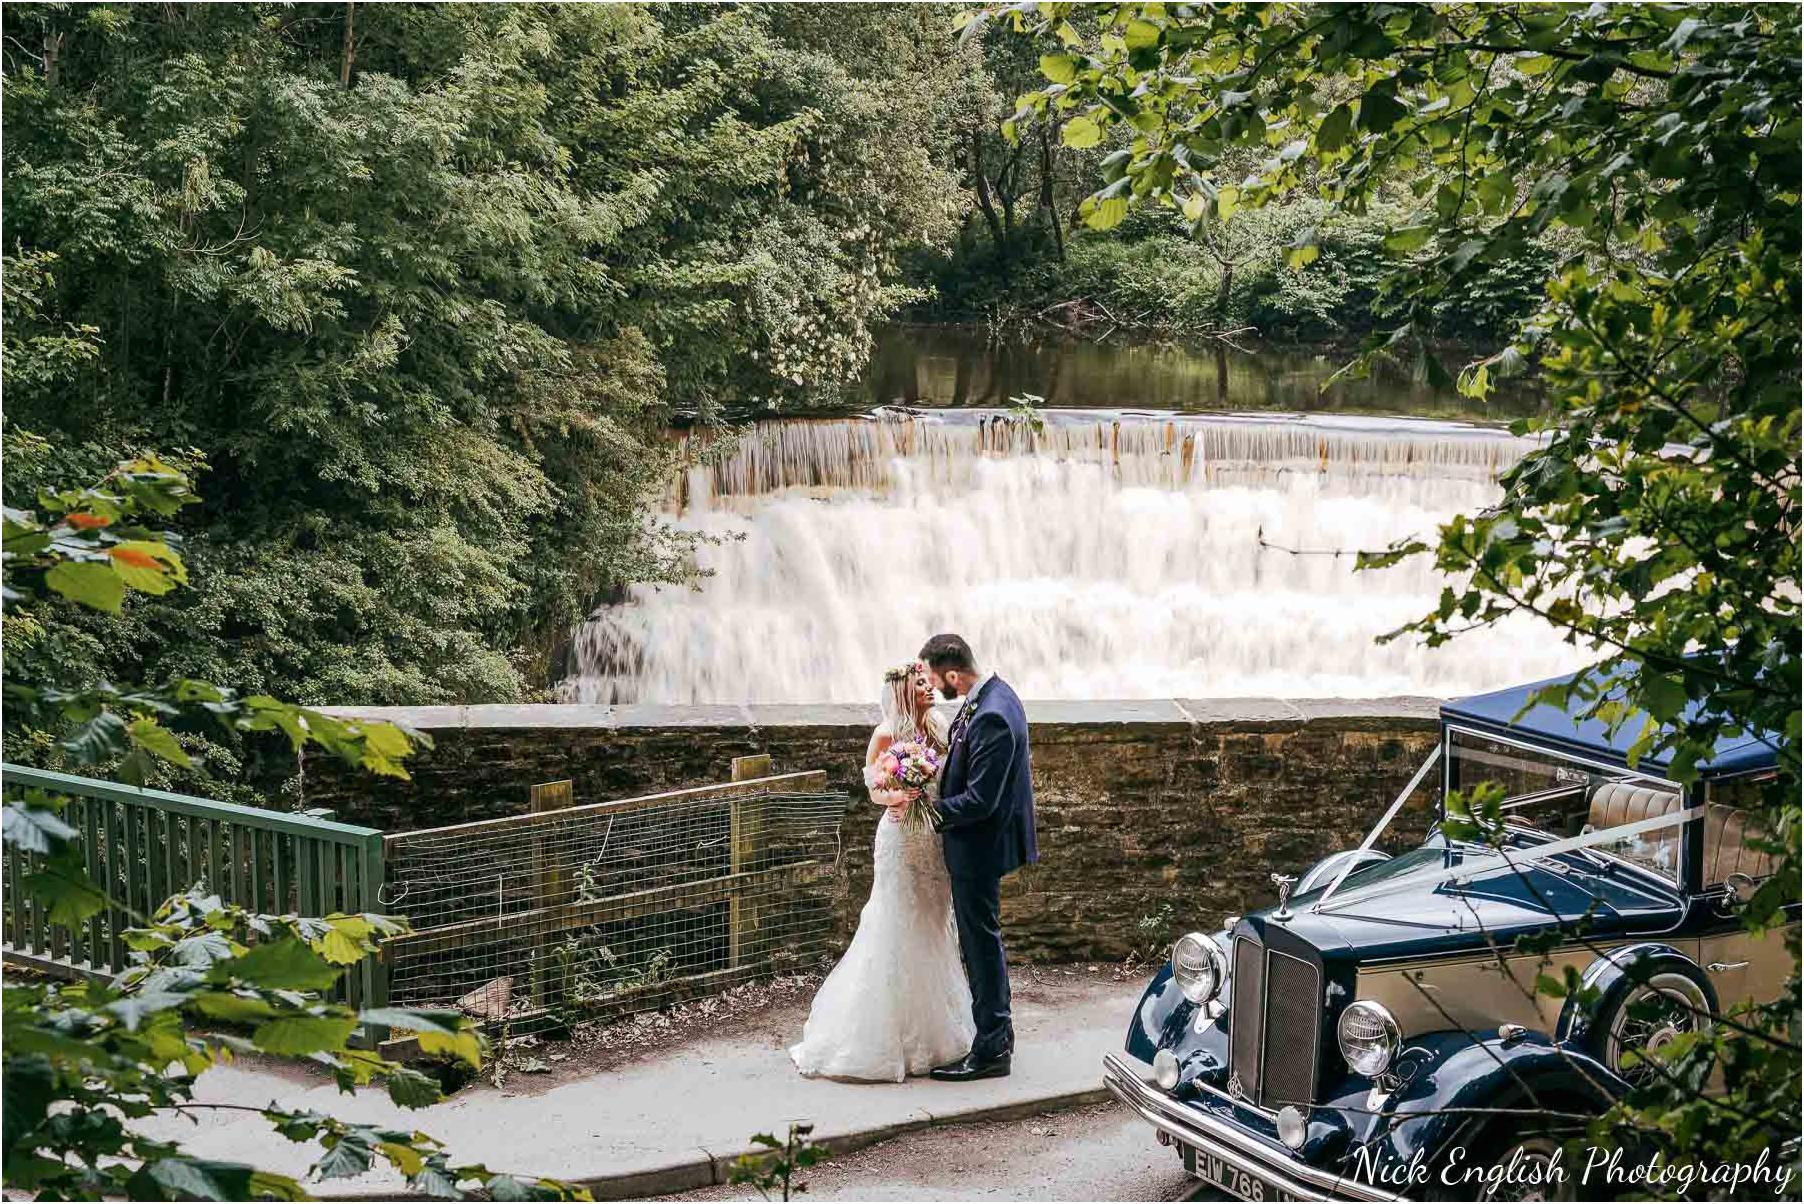 Whitebottom_Farm_Wedding_Manchester_Photograph-37.jpg